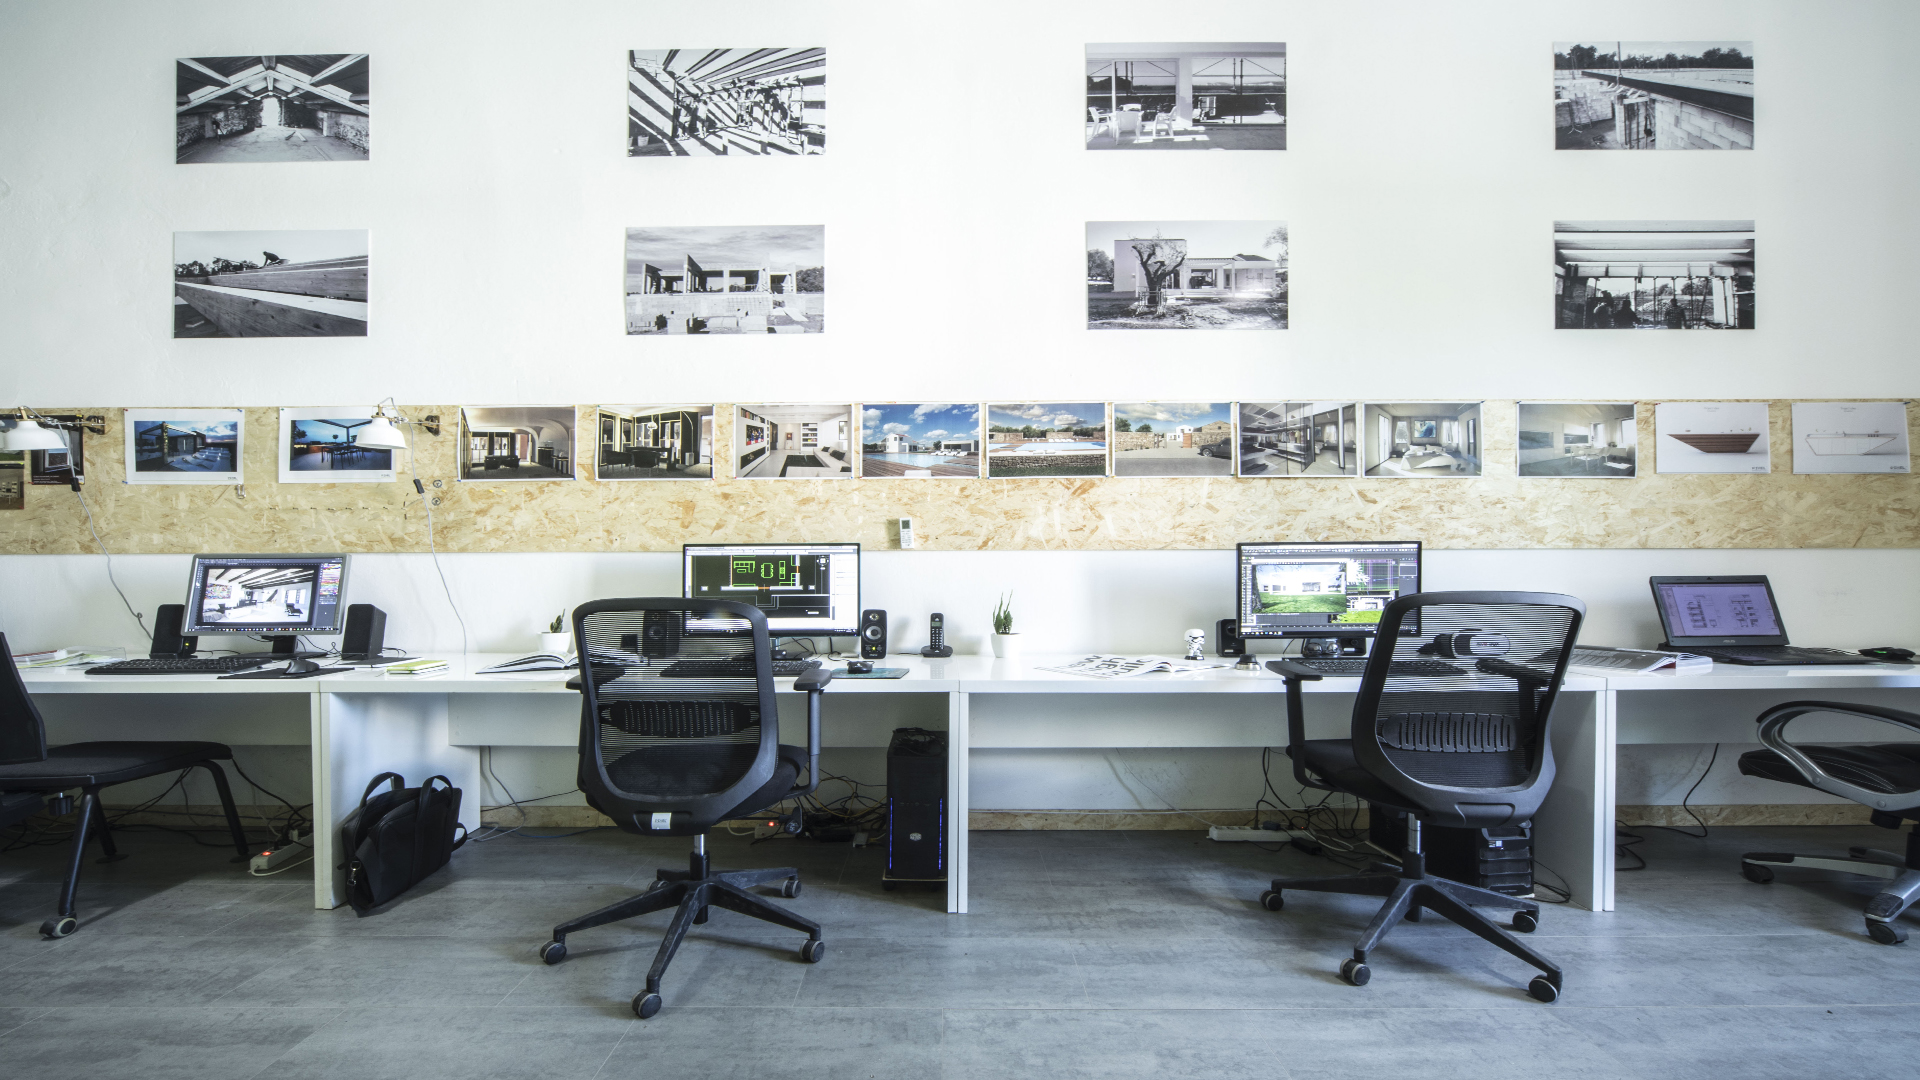 Studio-architettura-alghero-Pixel-11